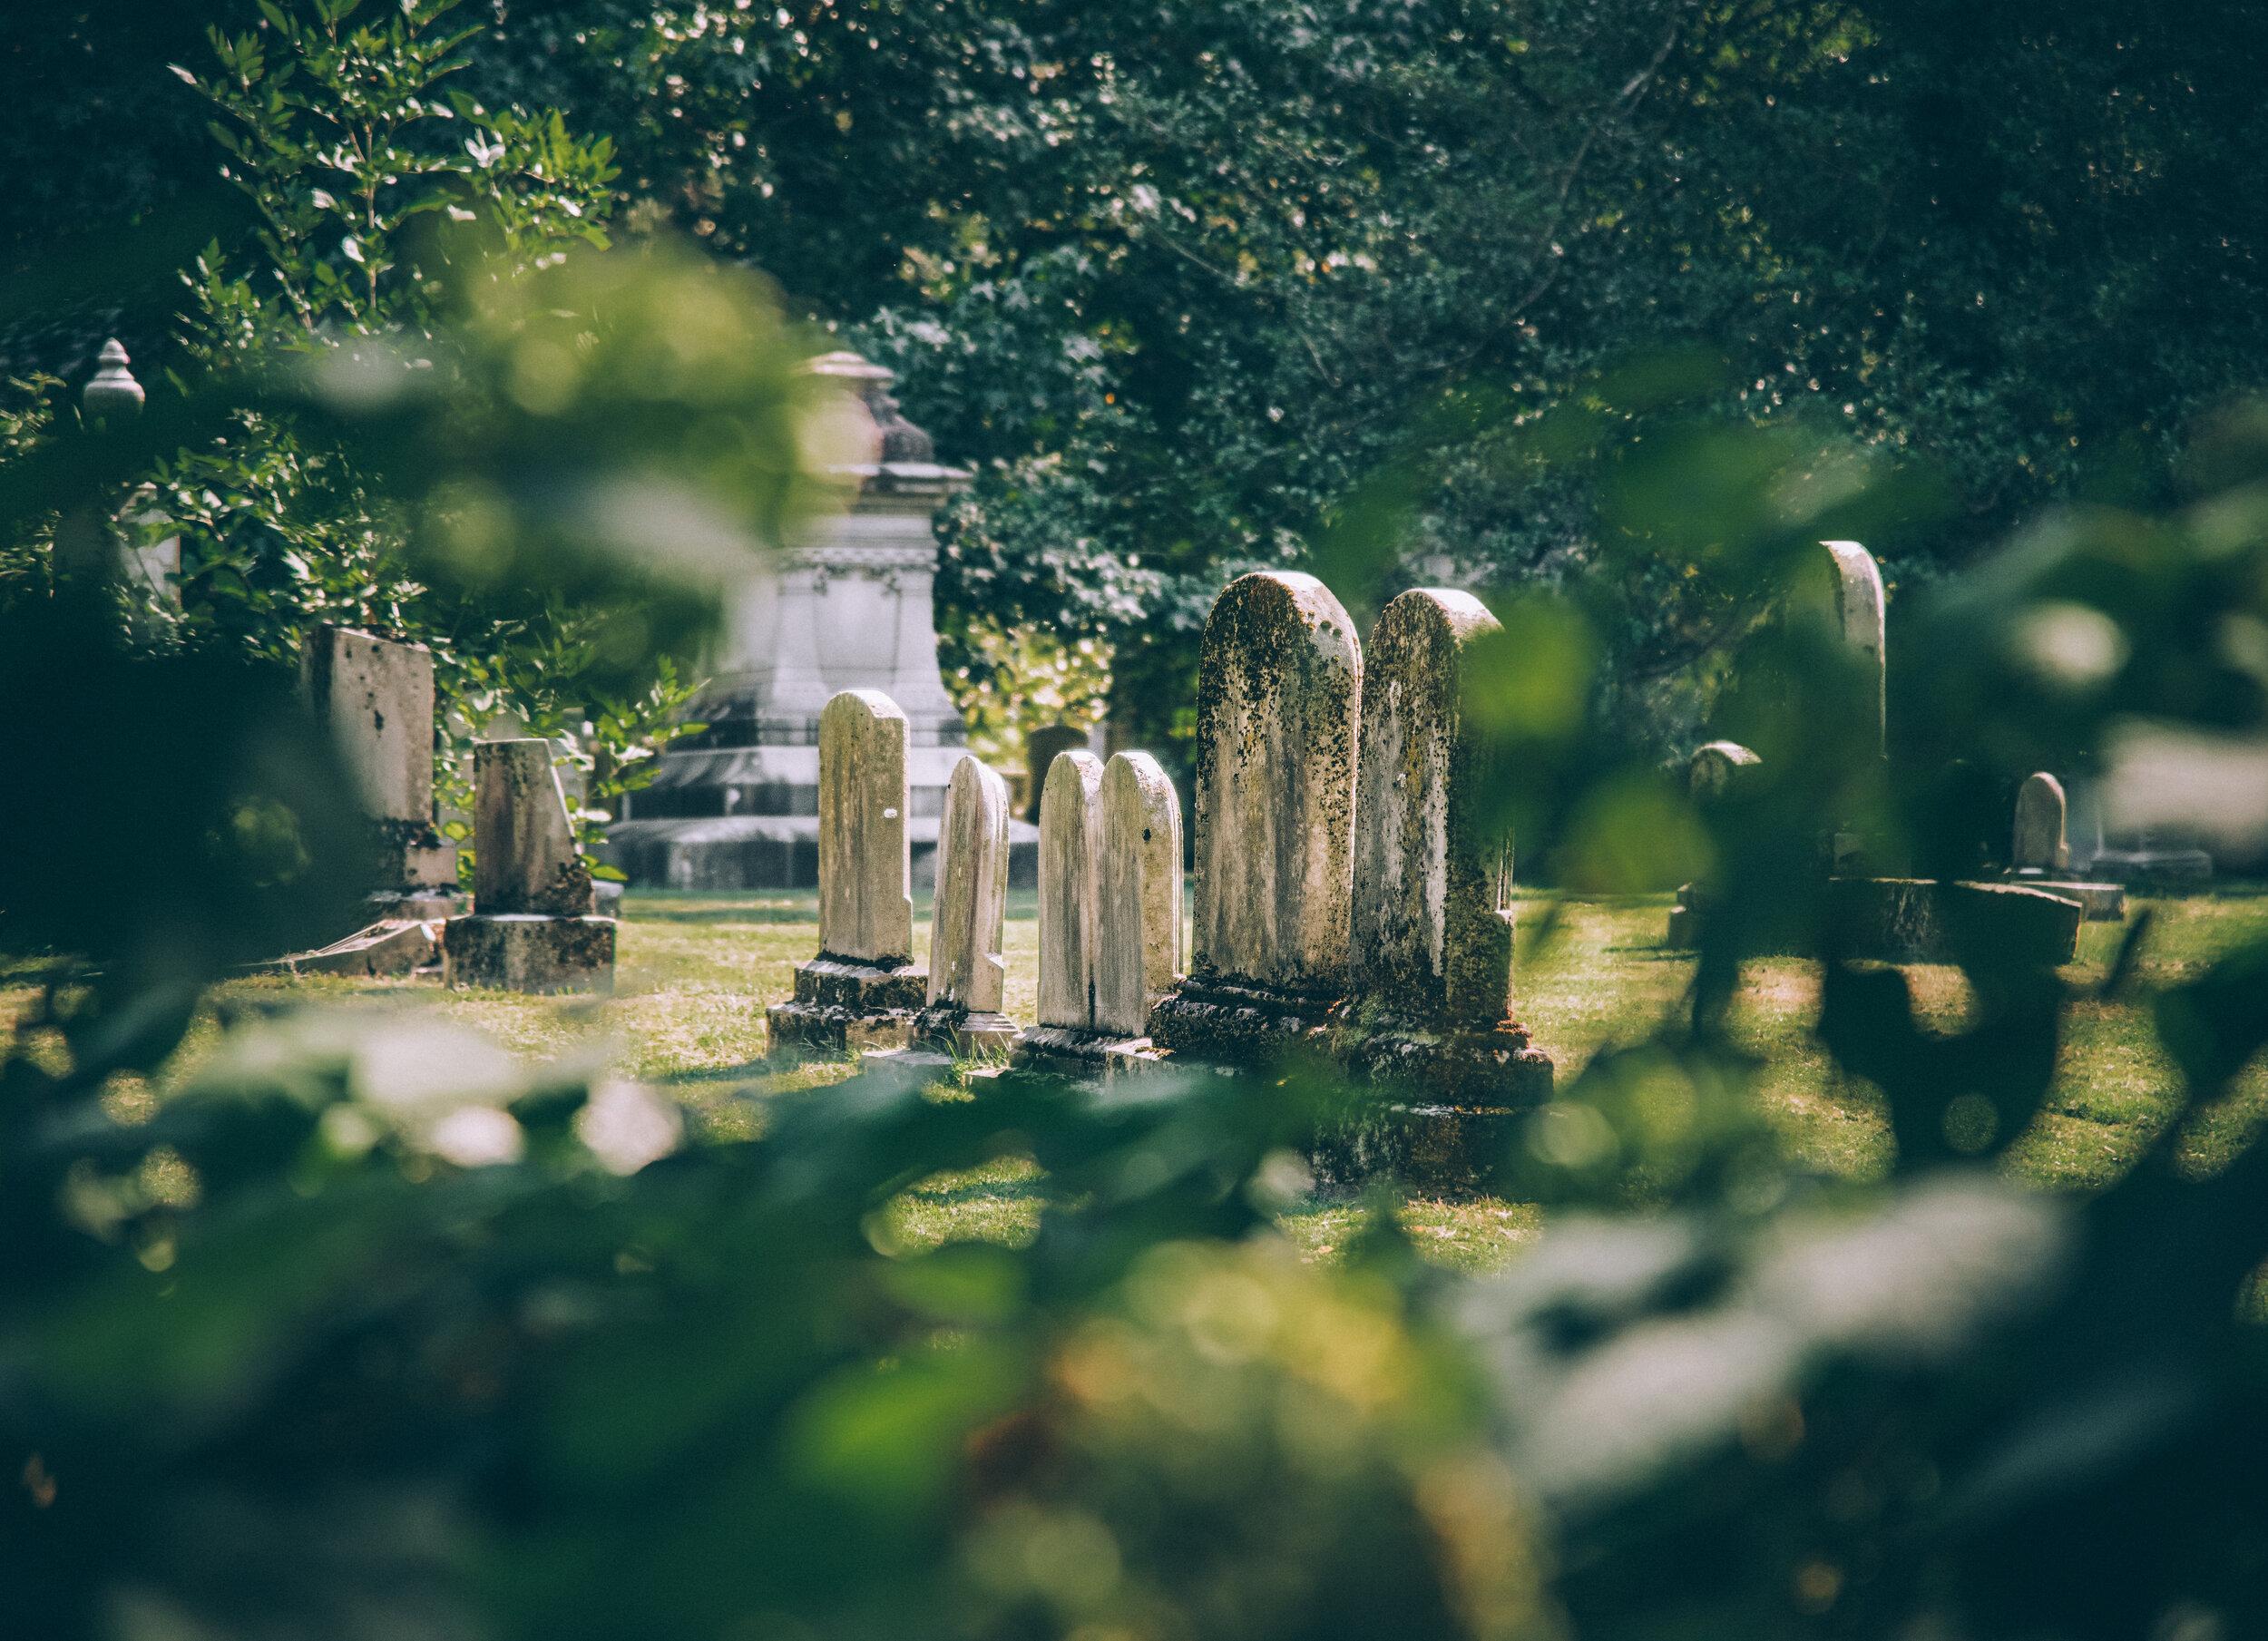 kw-lexington-cemetery-img5.jpg